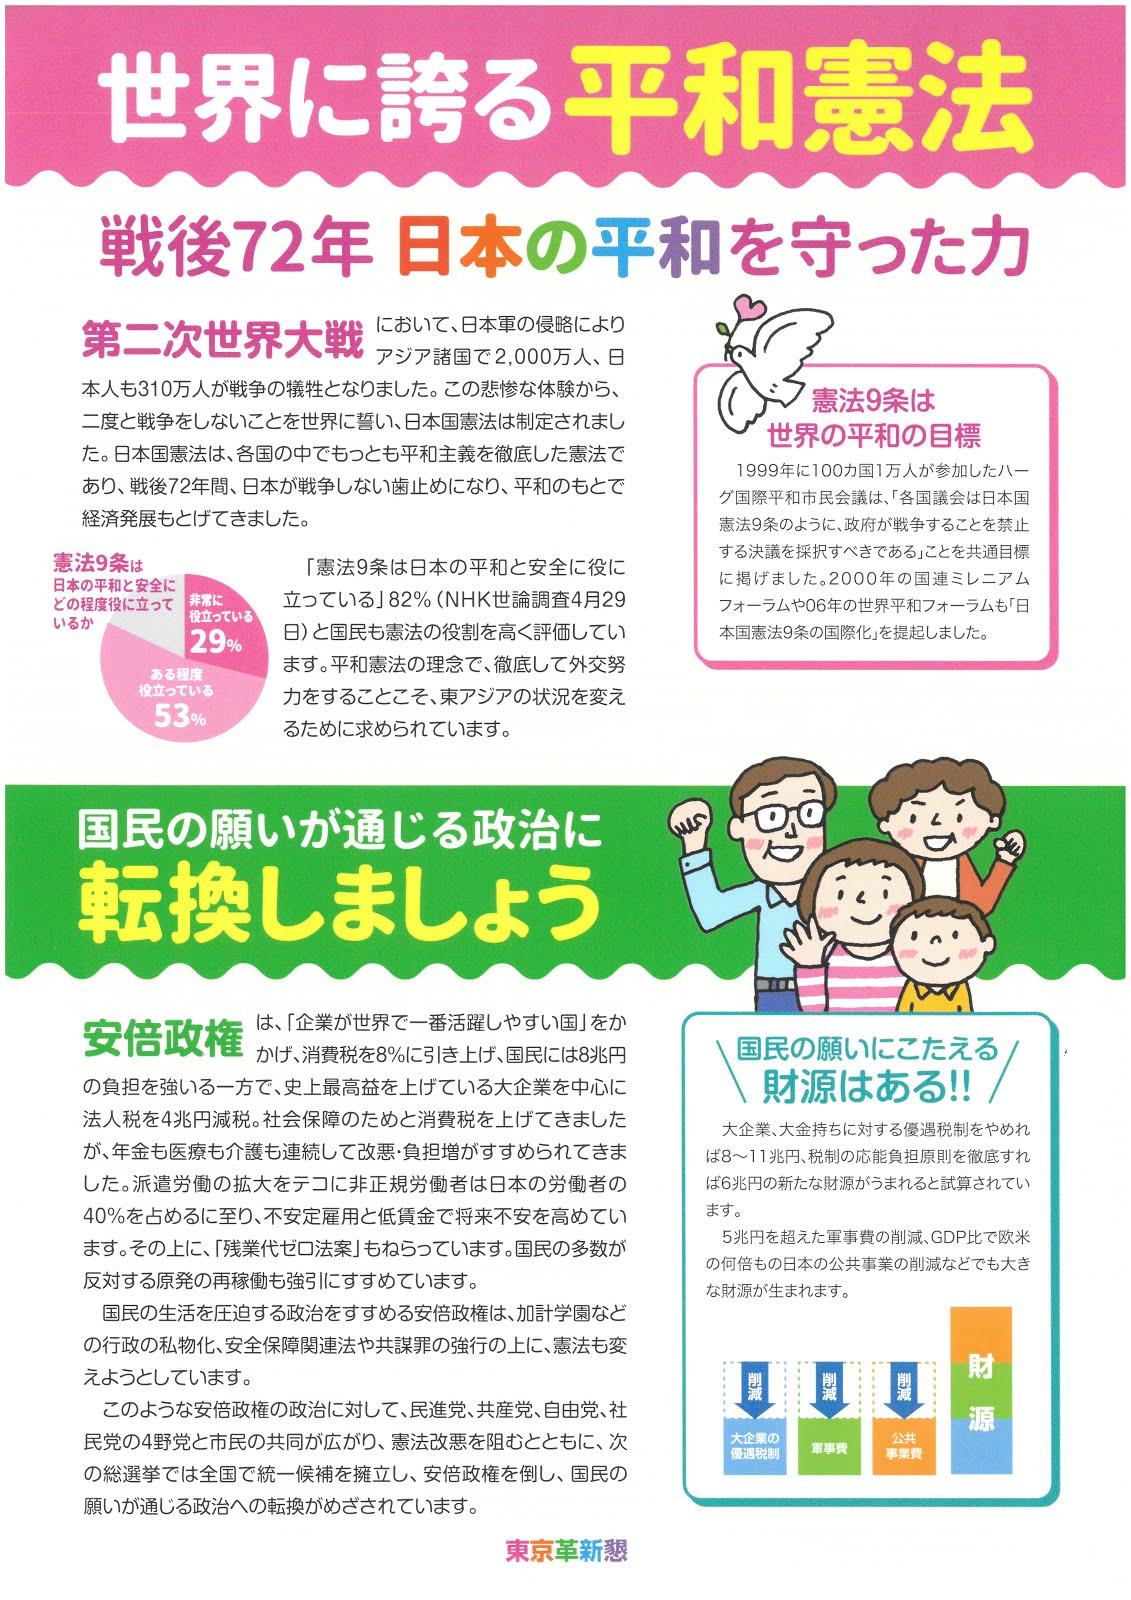 東京革新懇、「改憲NO!」ビラ10万枚作成。地域・職場革新懇に無料提供(下記は裏面)